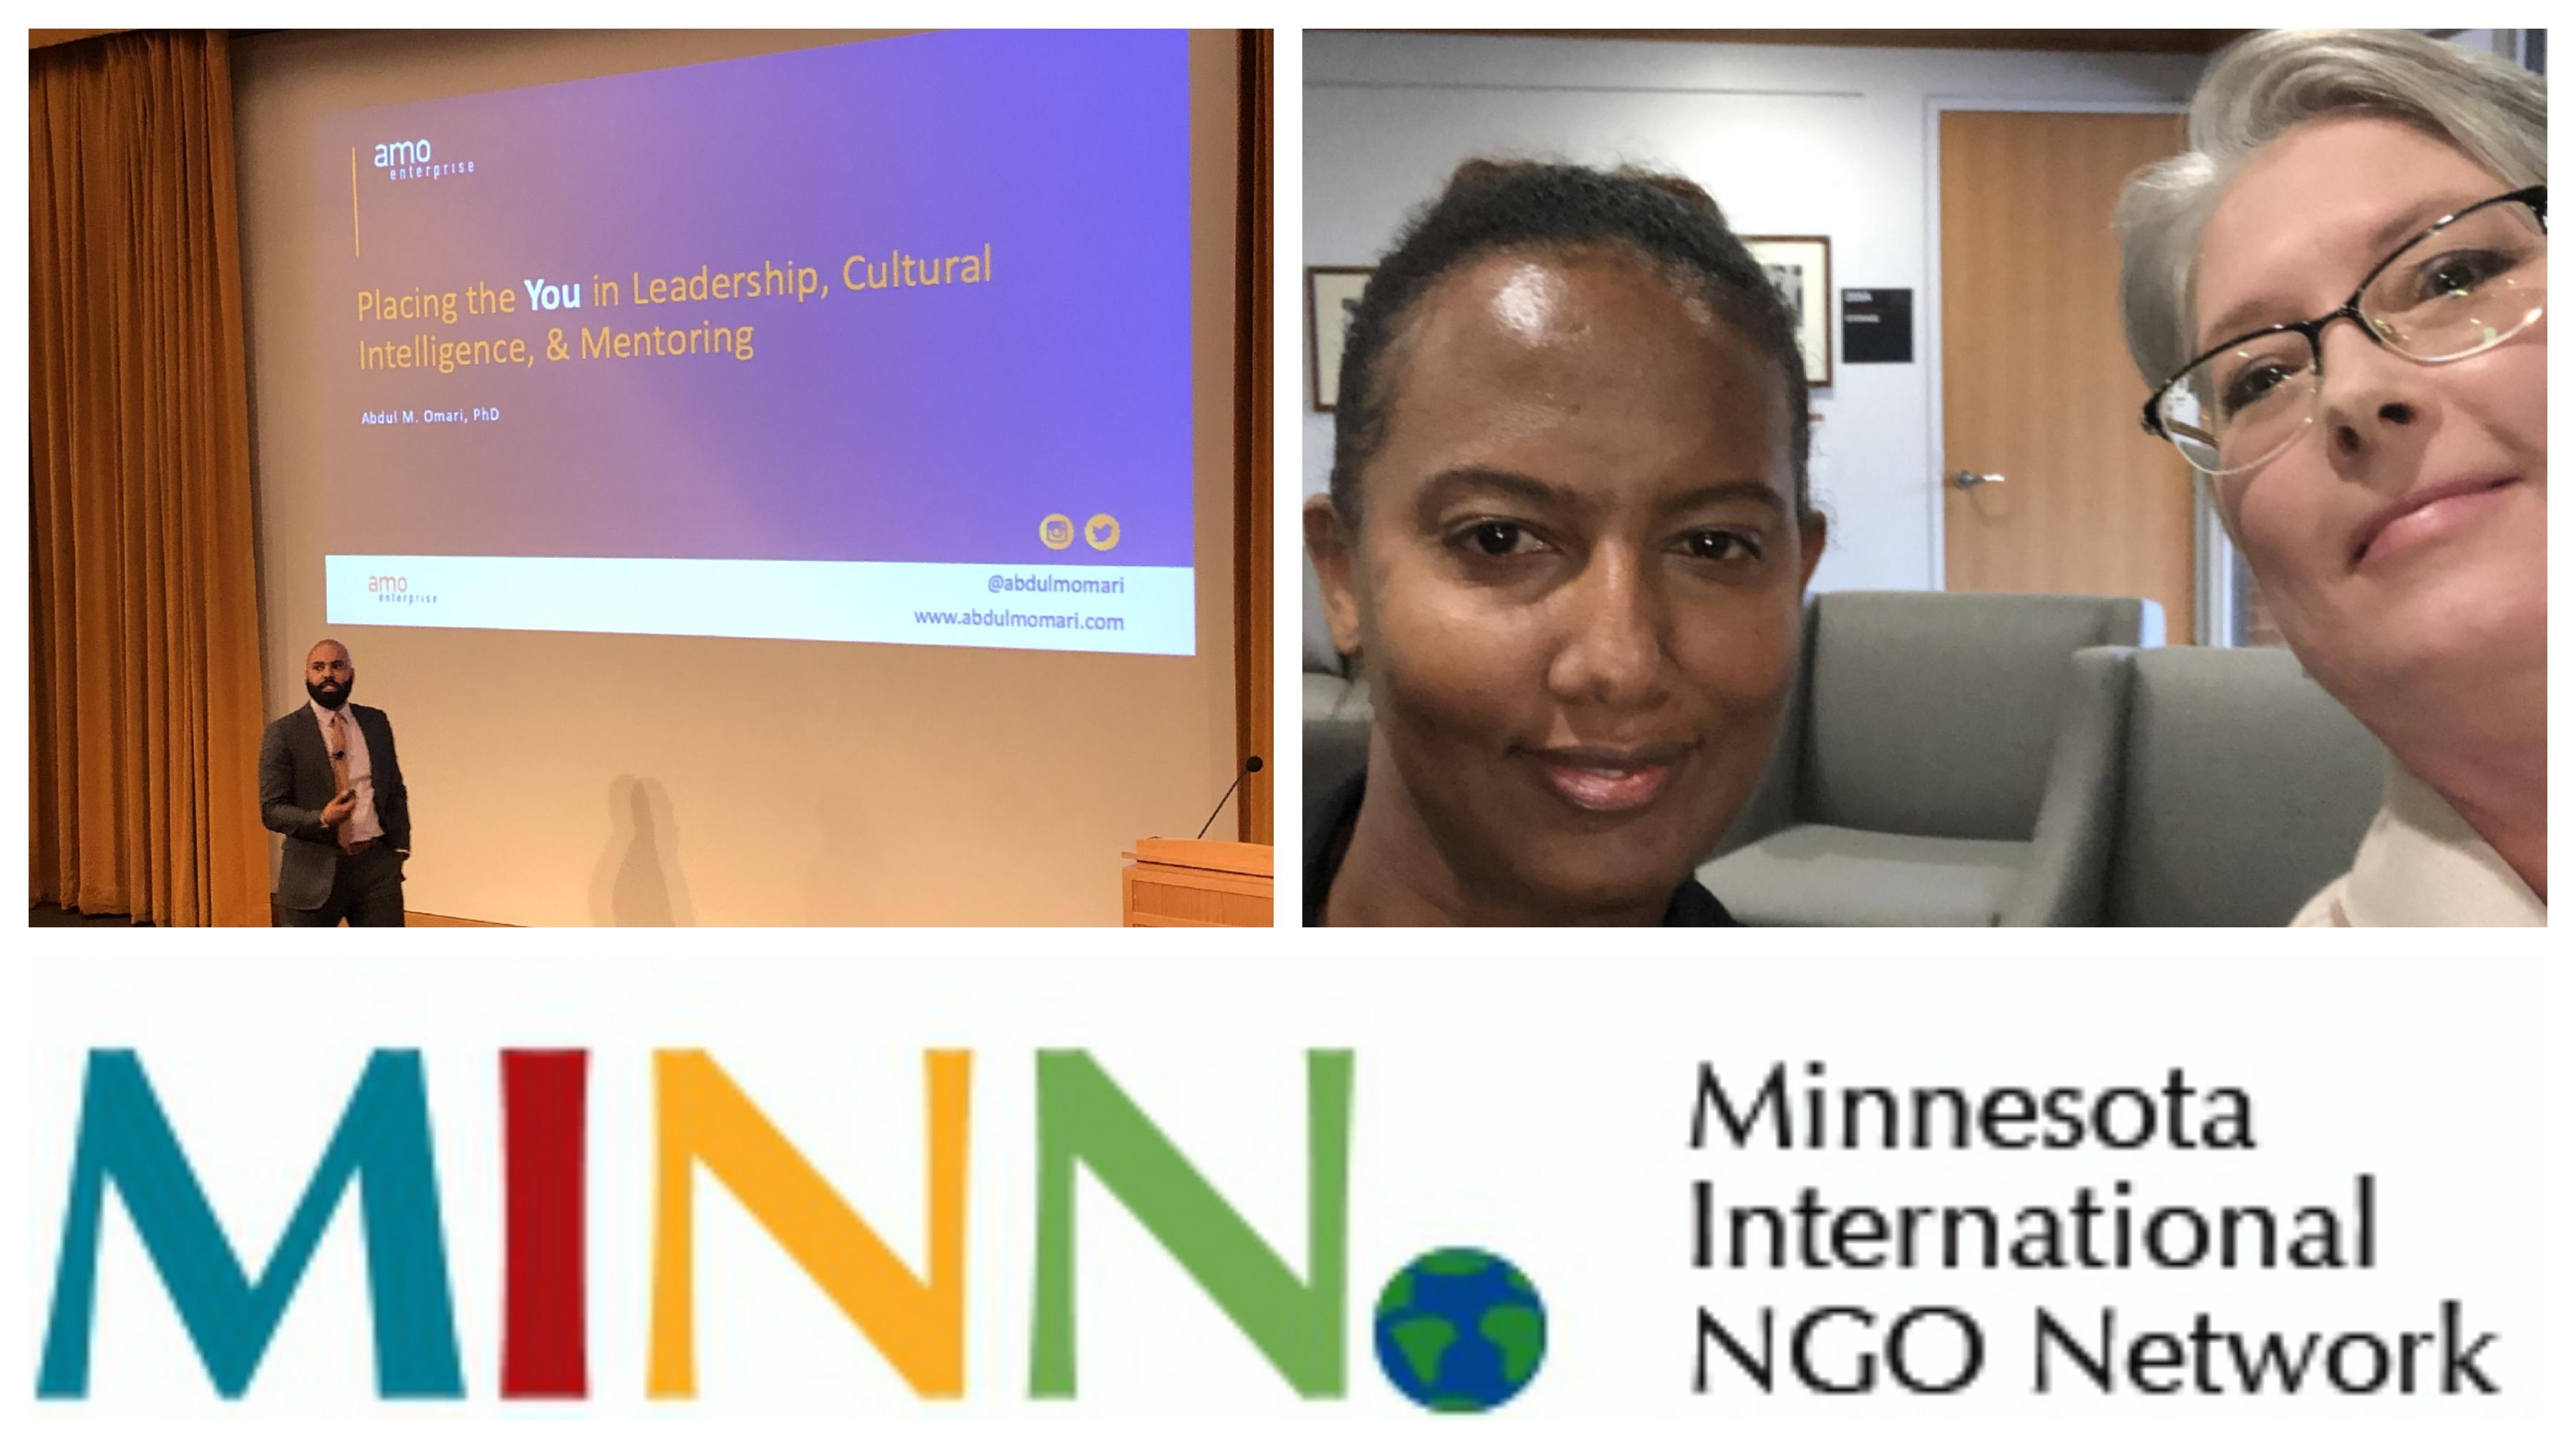 November 2019 International NGO MINN Network summit